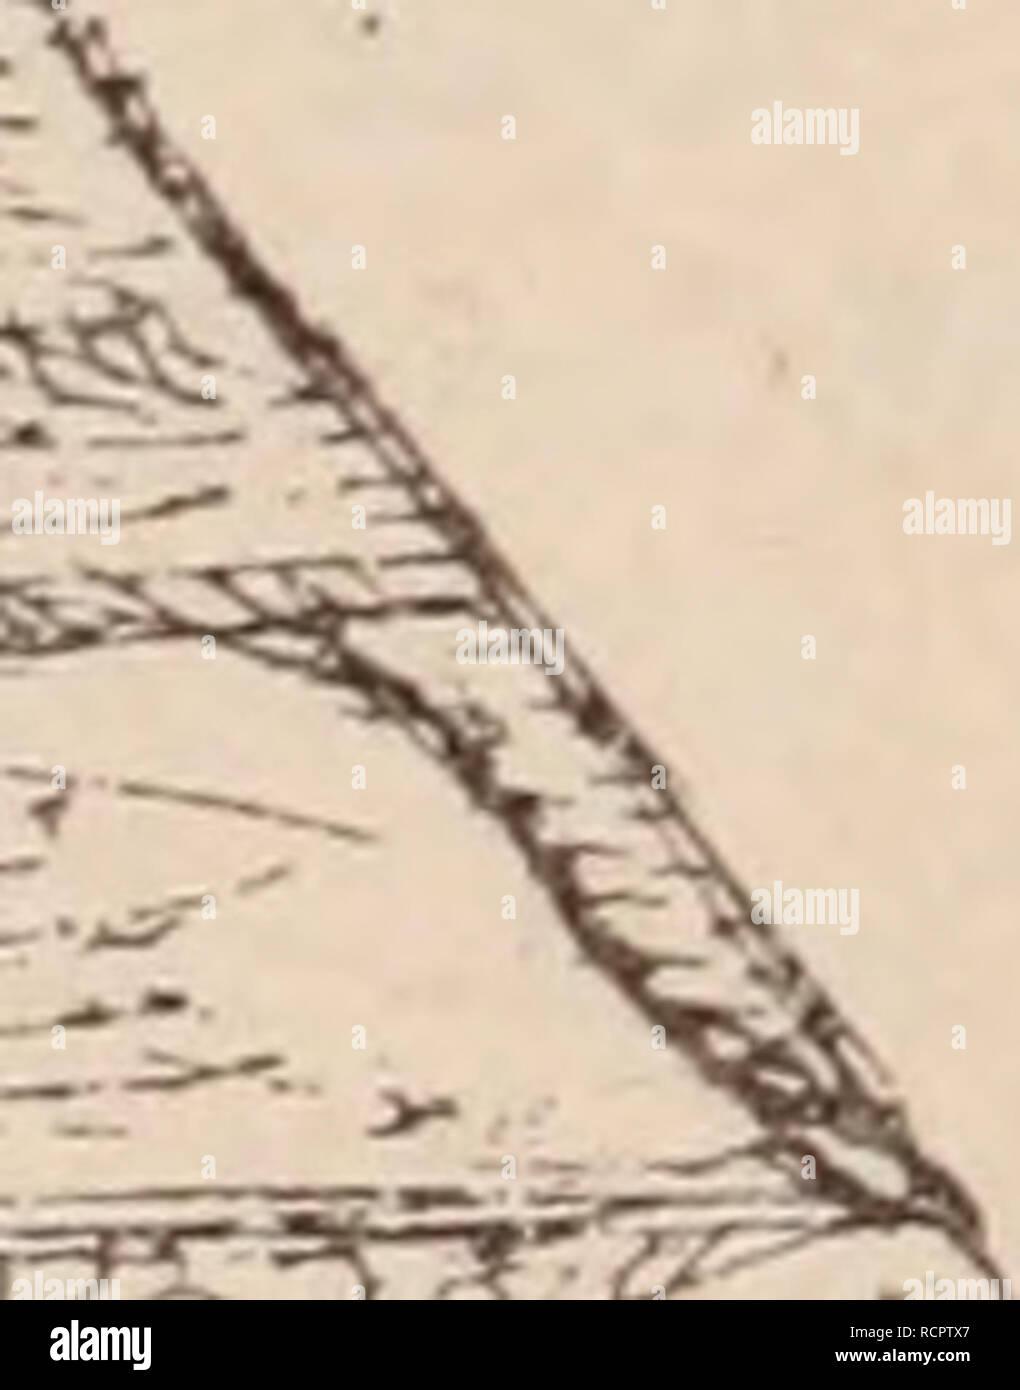 . Dictionnaire d'horticulture illustré / par D. Bois  préface de Maxime Cornu  avec la collaboration de E. André ... [et al.].. Horticulture; Dictionaries.. Fig. 332. â Caisse à Pêches. Please note that these images are extracted from scanned page images that may have been digitally enhanced for readability - coloration and appearance of these illustrations may not perfectly resemble the original work.. Bois, D. (Désiré), 1856-1946.. Paris : P. Klincksieck, 1893-1899. Stock Photo